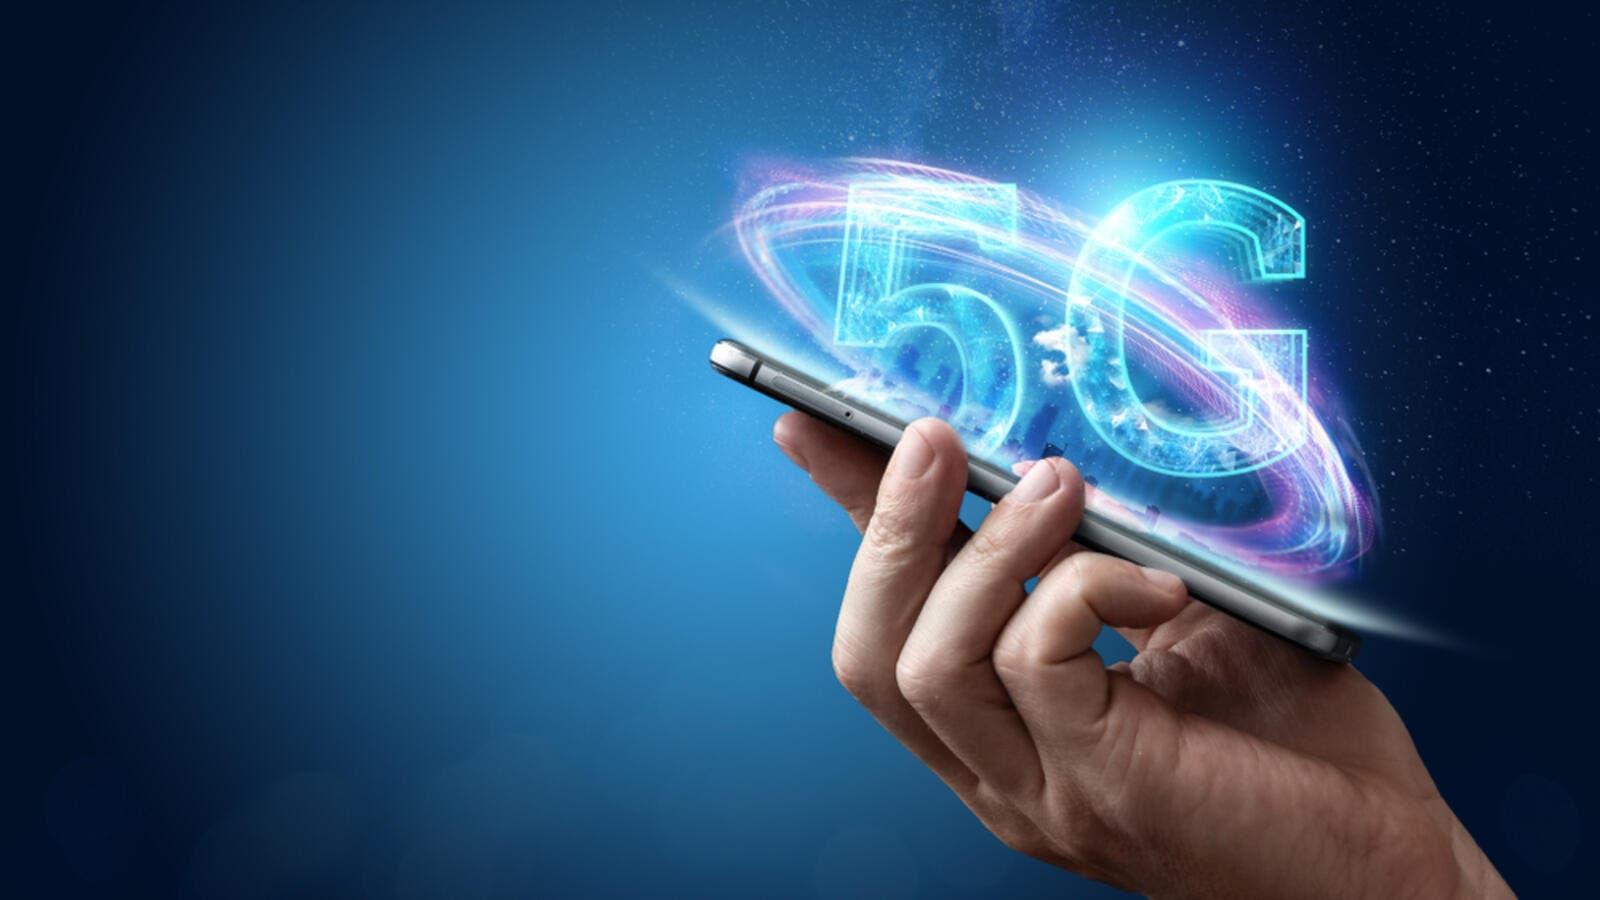 Realme Drops X50 Pro with 5G